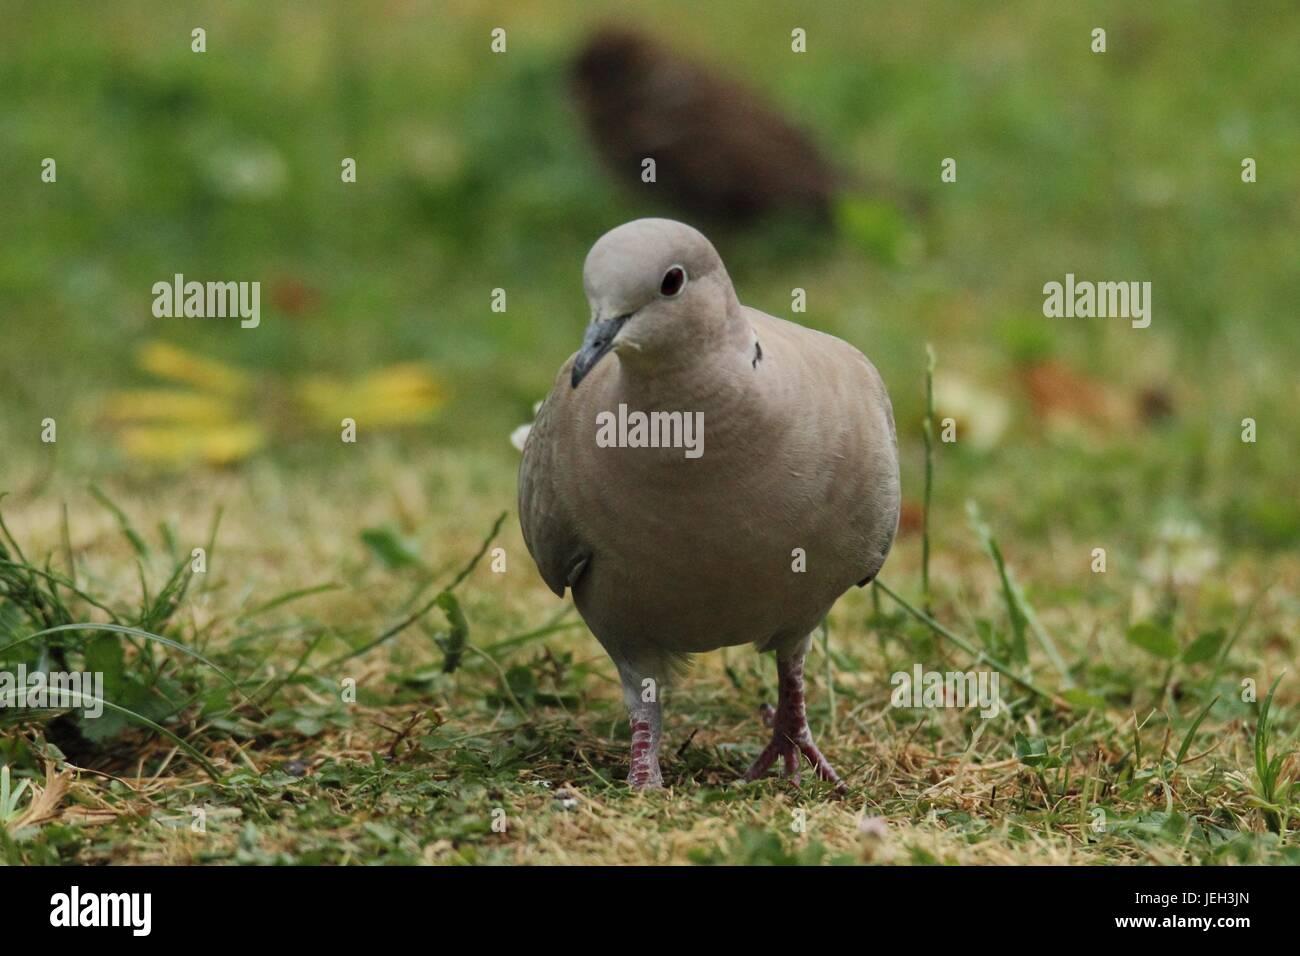 Eurasian collared dove in der Wiese Stockfoto